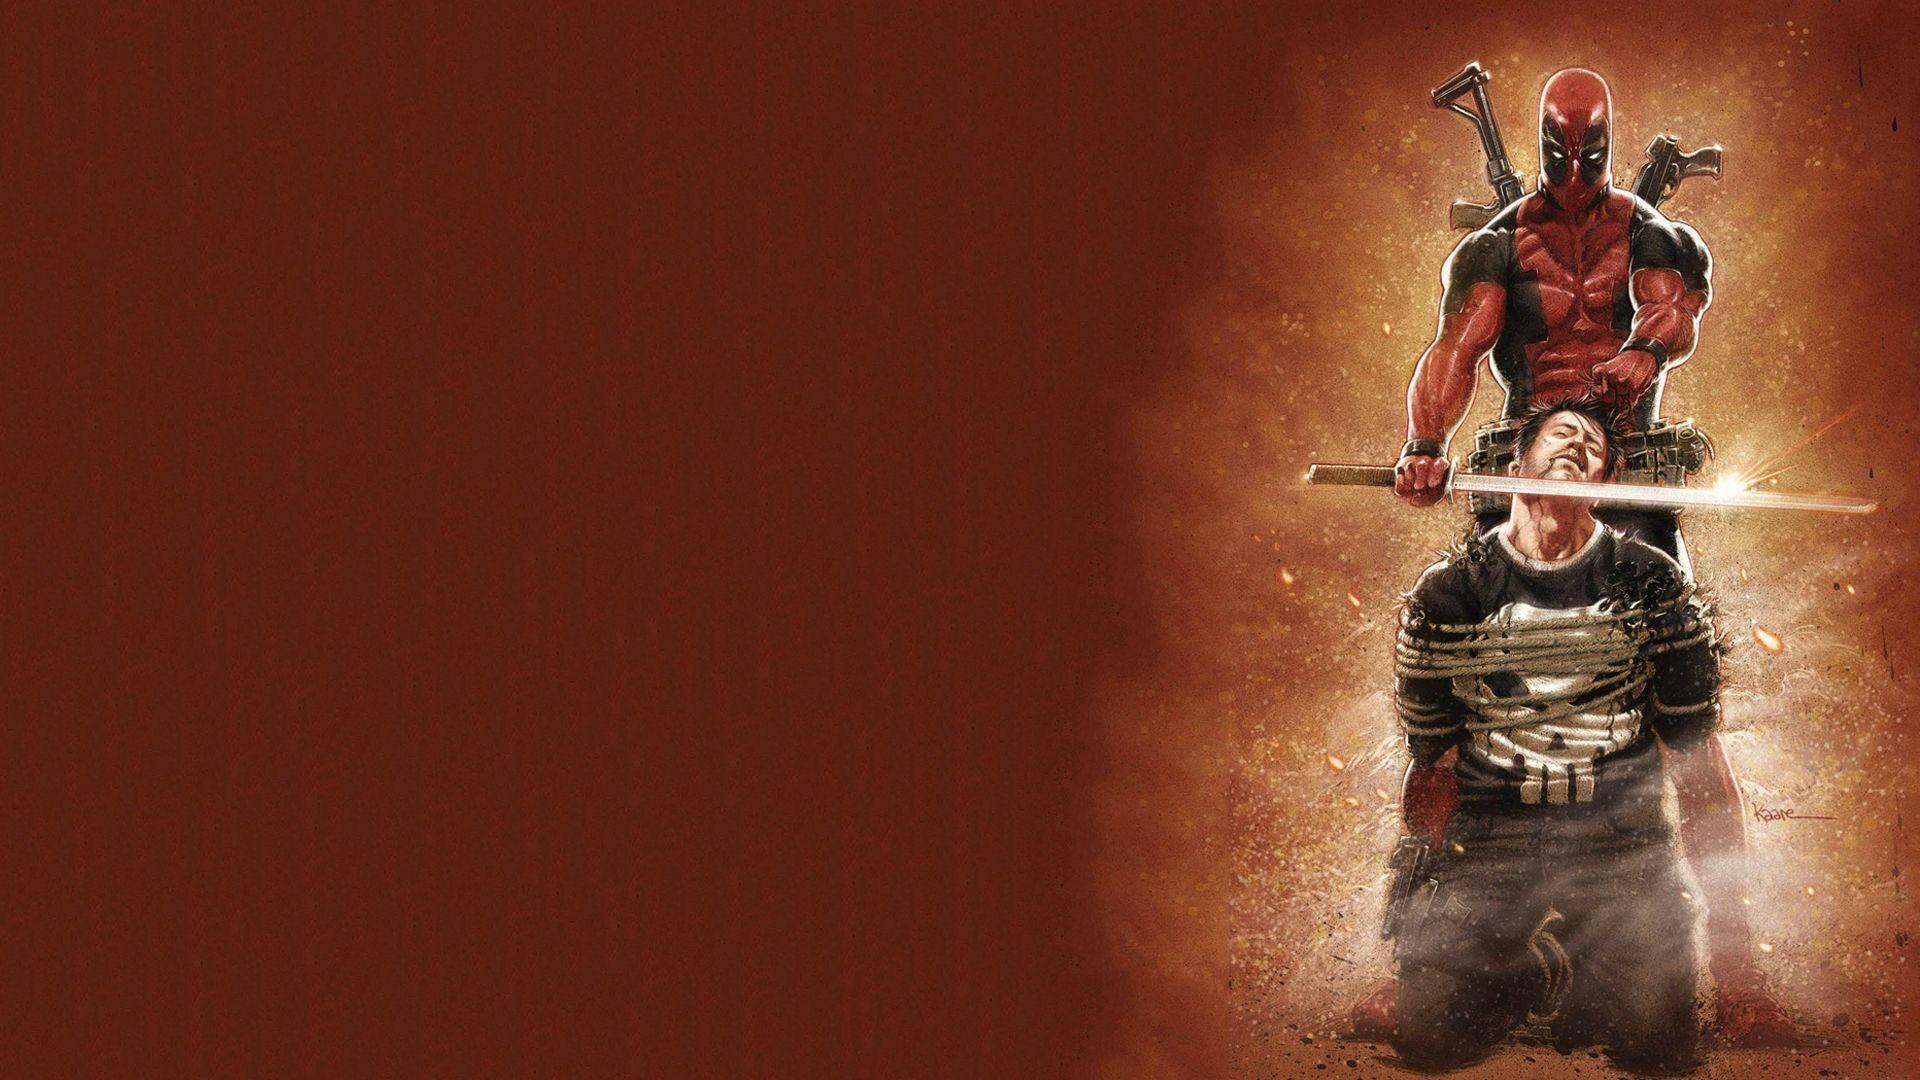 Punisher phone wallpaper 70 images - Deadpool download 1080p ...